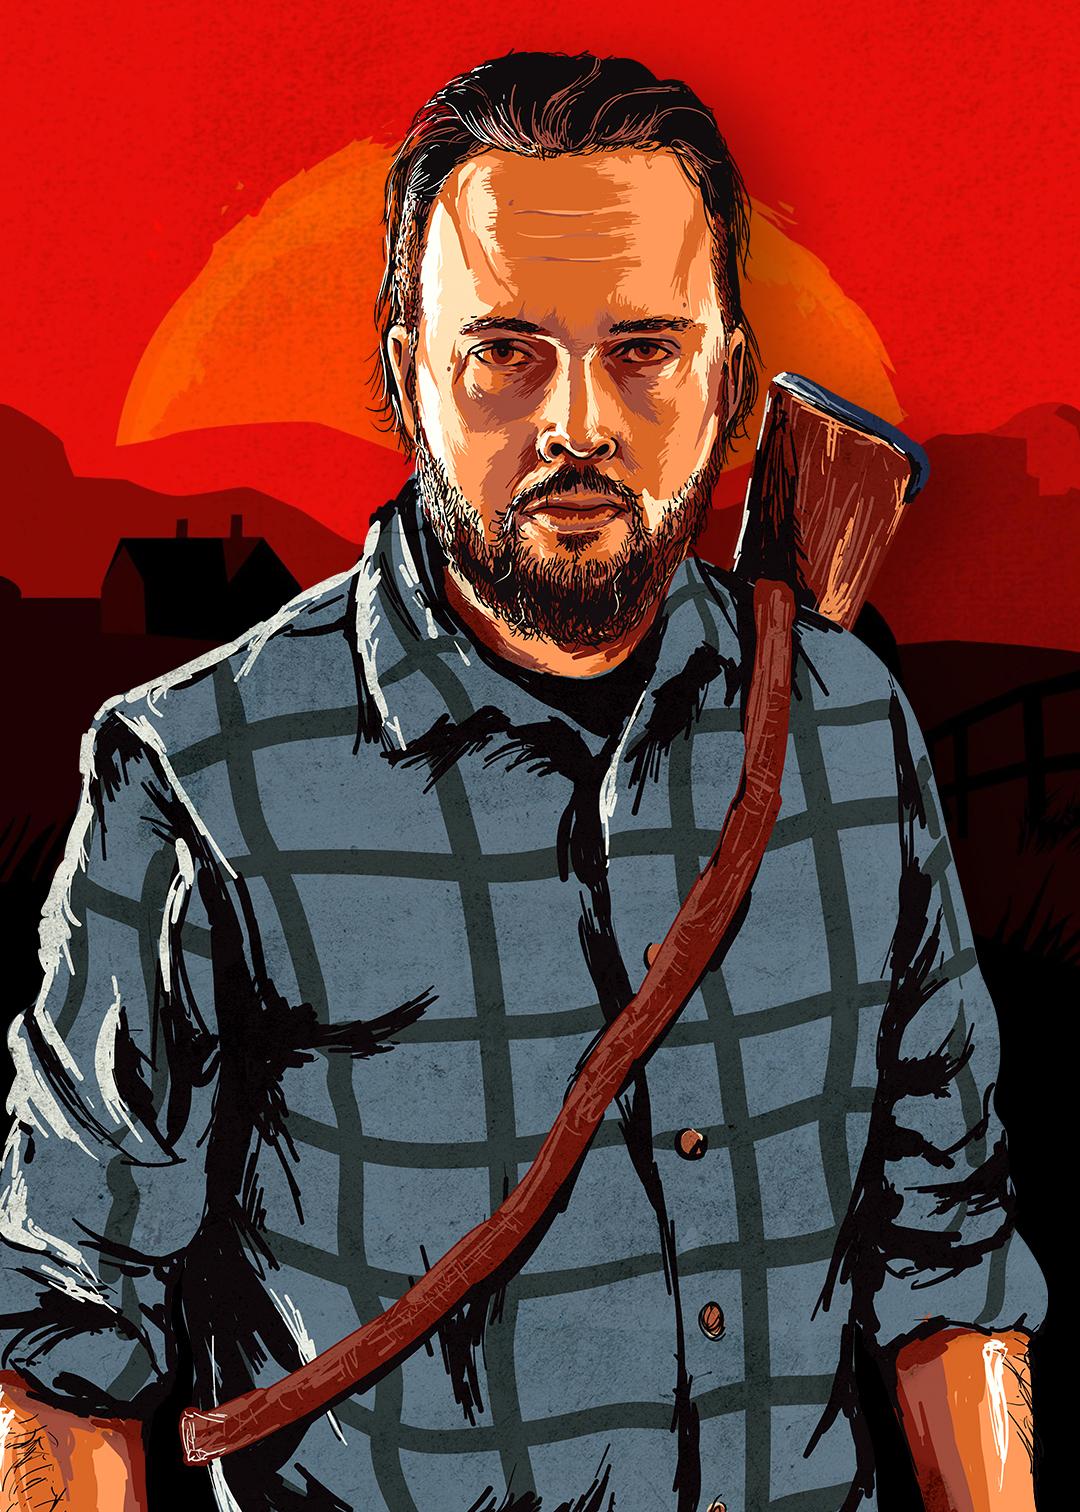 Red Dead Redemption Image final